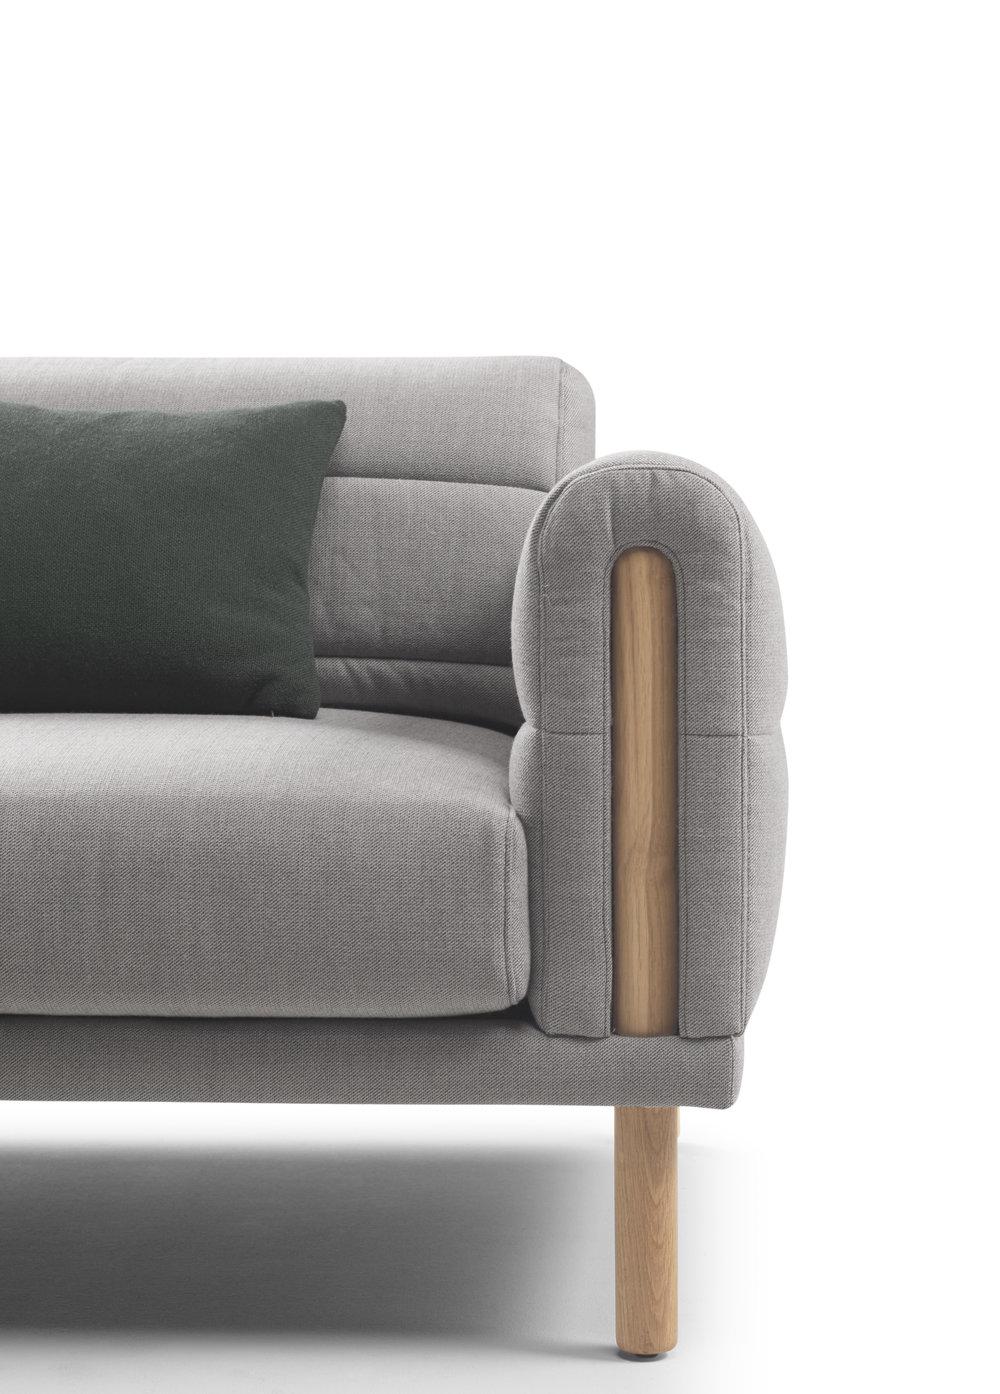 Abric sofa-Silvia Ceñal-Bosc-2